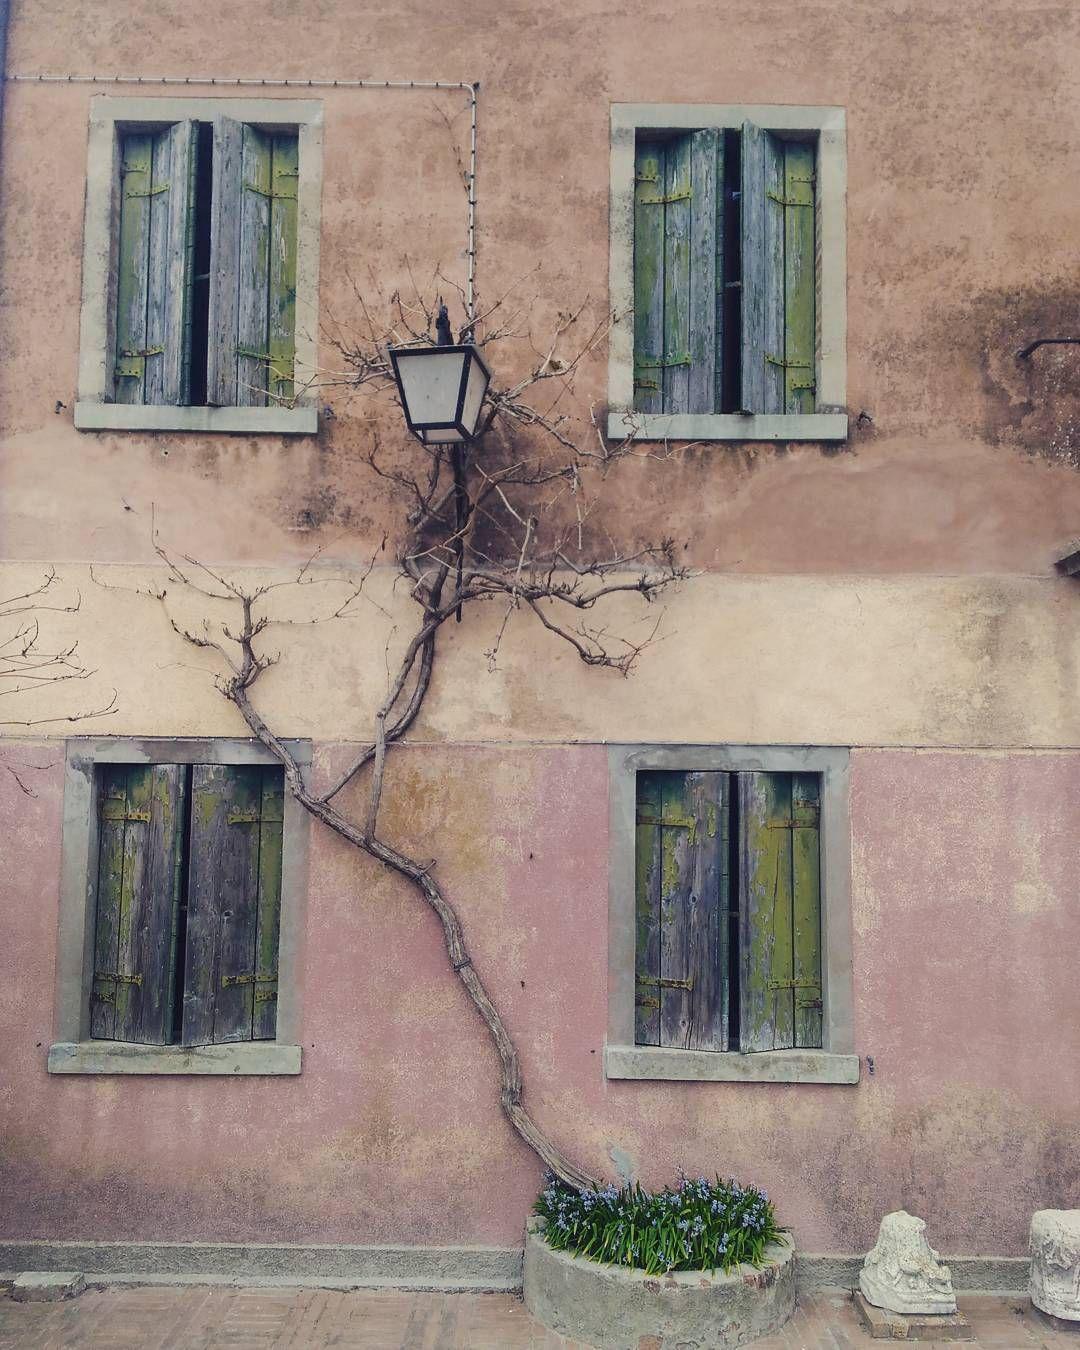 #torcello #veneto #italy #visitveneto #facciata #casa #rampicante #igersveneto #ig_veneto #igersvenezia #venice #isola #bellaitalia #beautifulitaly by alicolorate